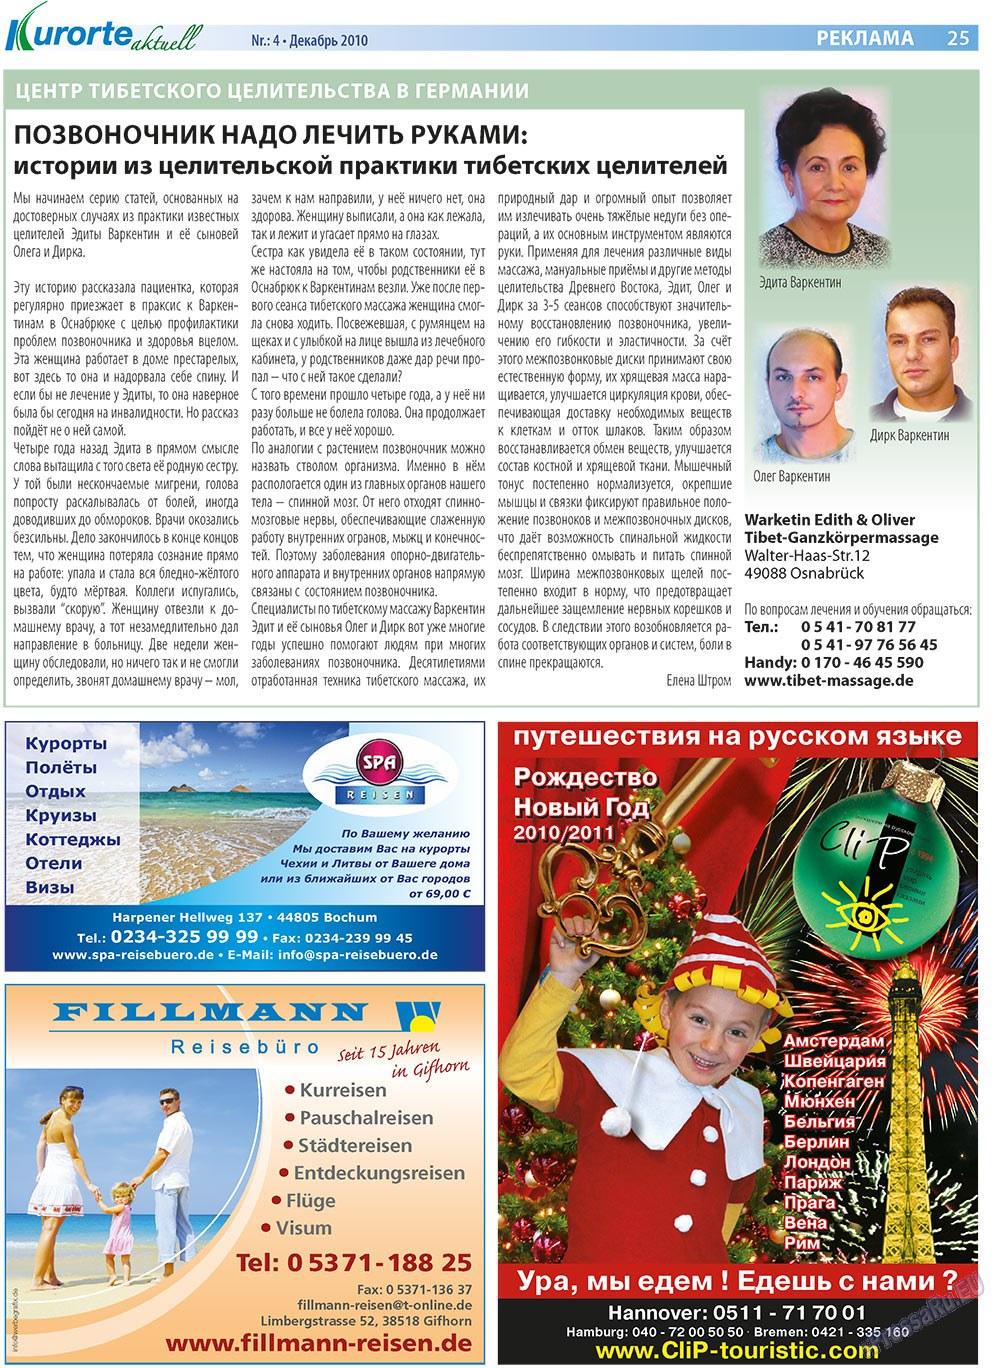 Kurorte aktuell (газета). 2010 год, номер 4, стр. 25